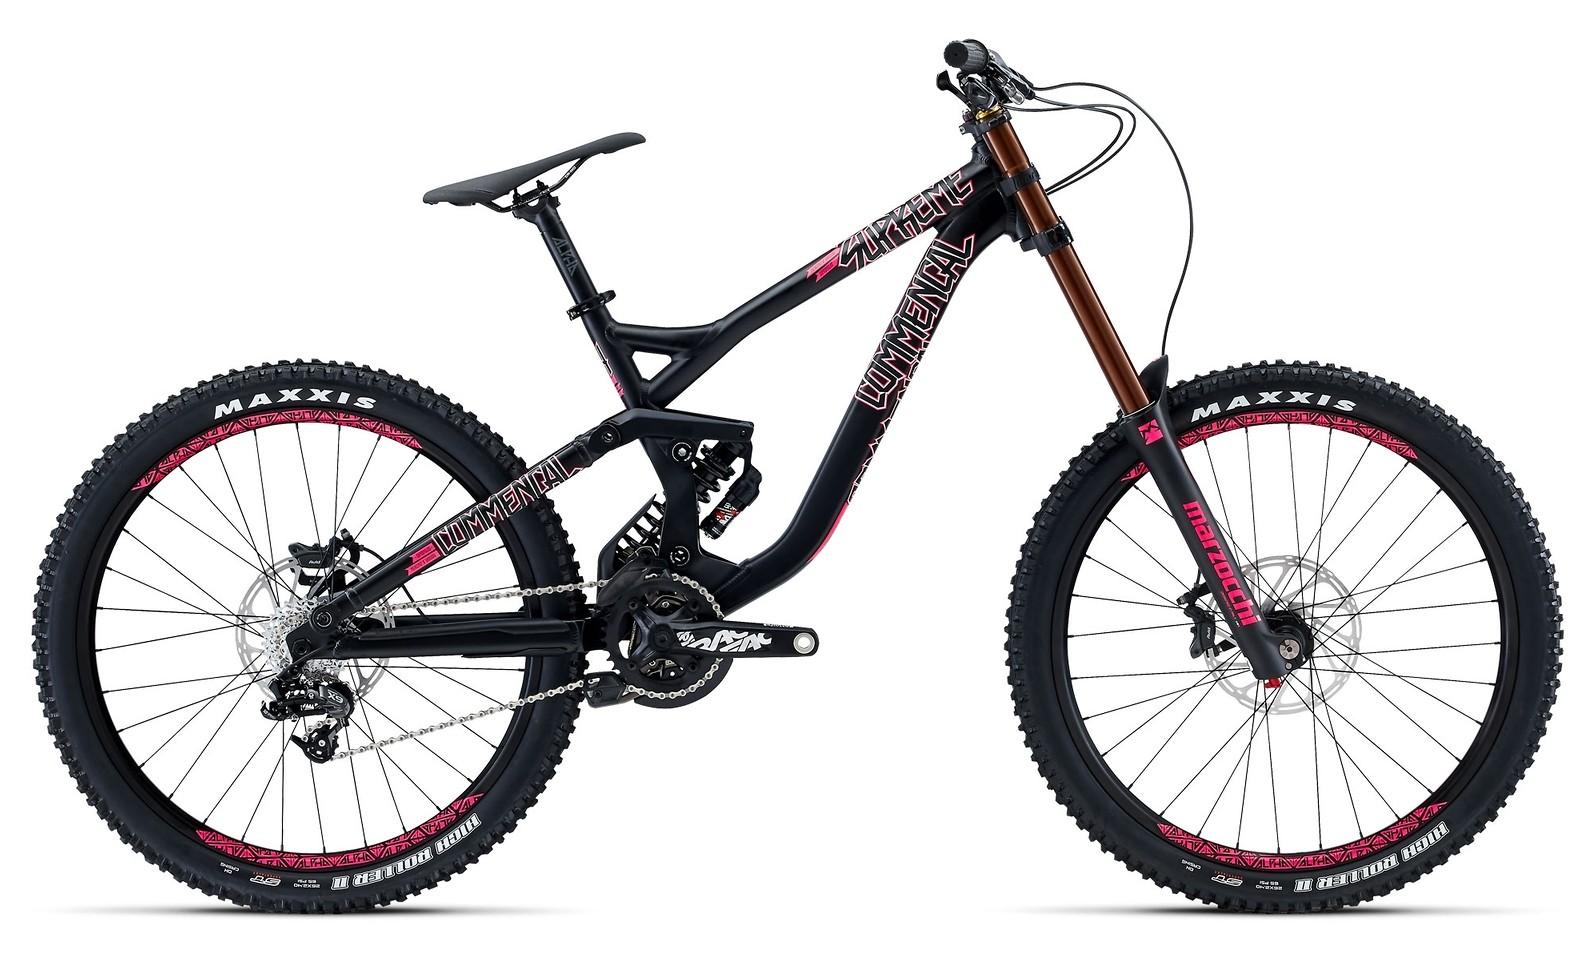 2015 Commencal Supreme DH V3 Park 26 bike